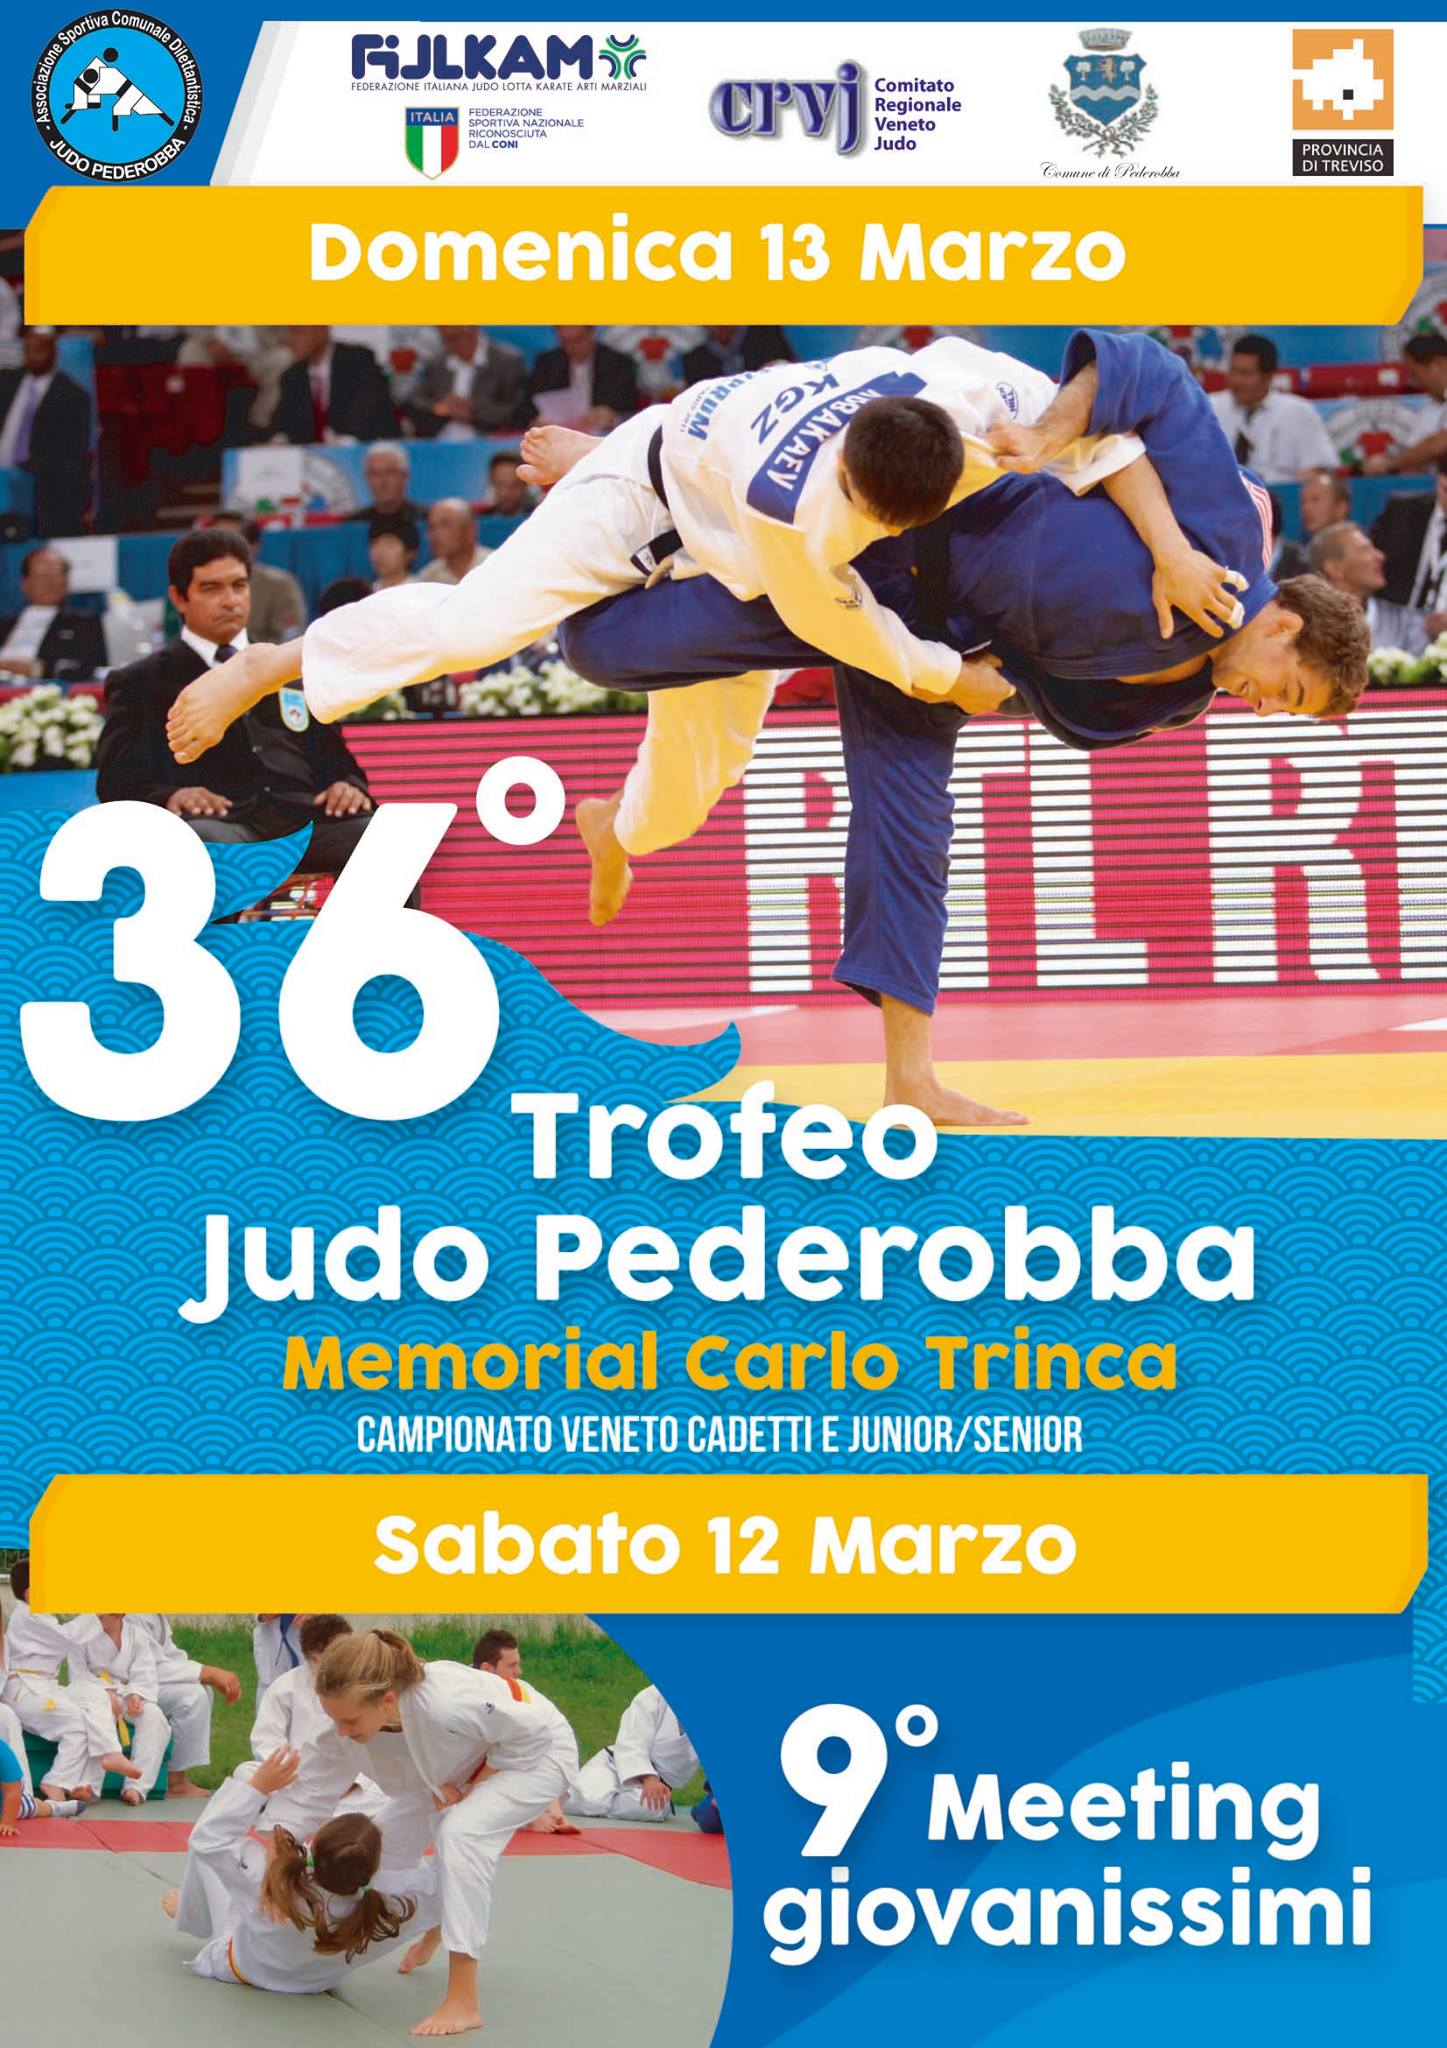 36 Trofeo Judo Pederobba